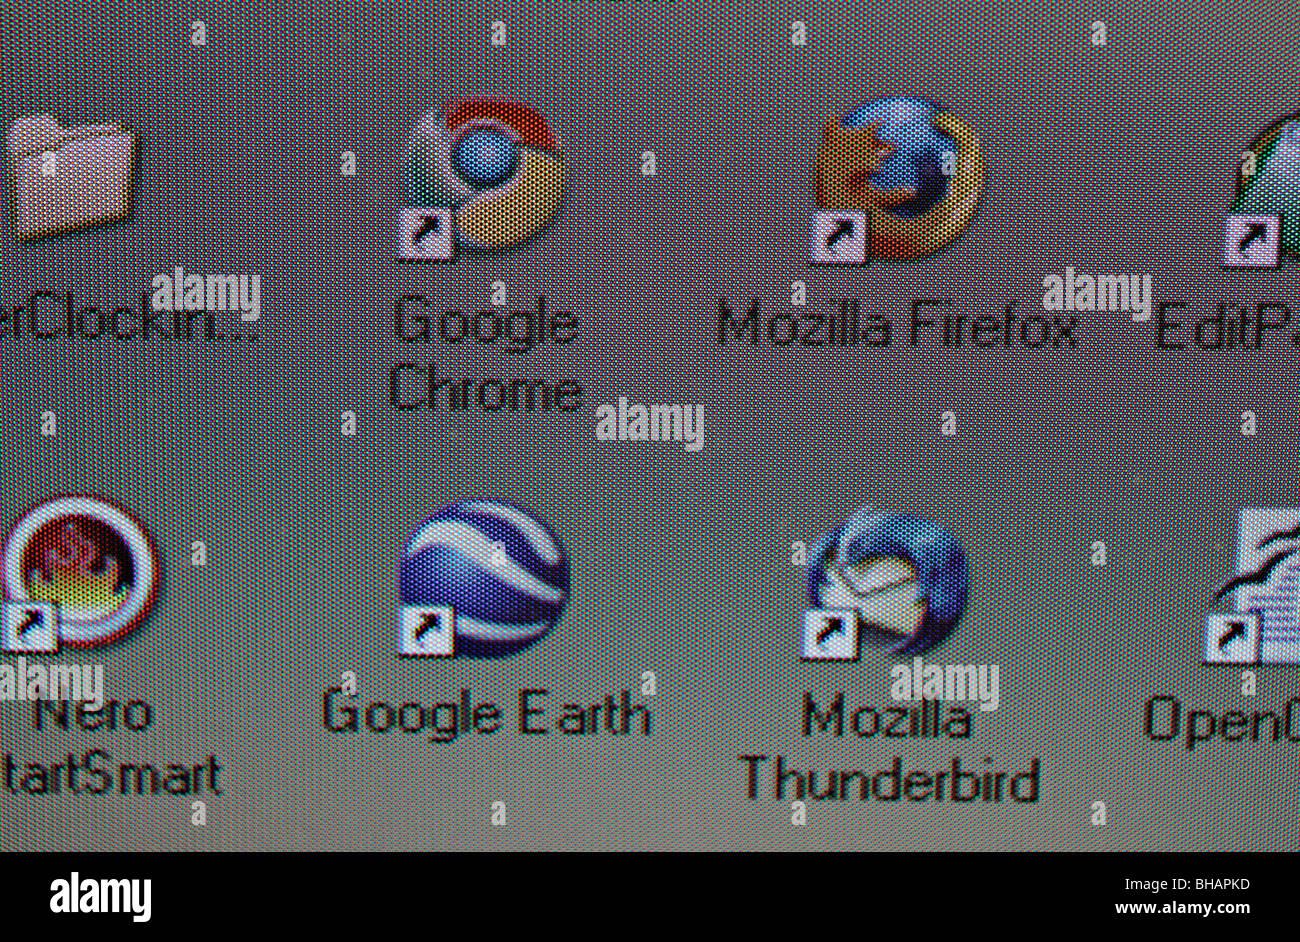 Computer Desktop icons Google Chrome, Mozilla Thunderbird, Google Earth, Mozilla Firefox - screenshot - Stock Image